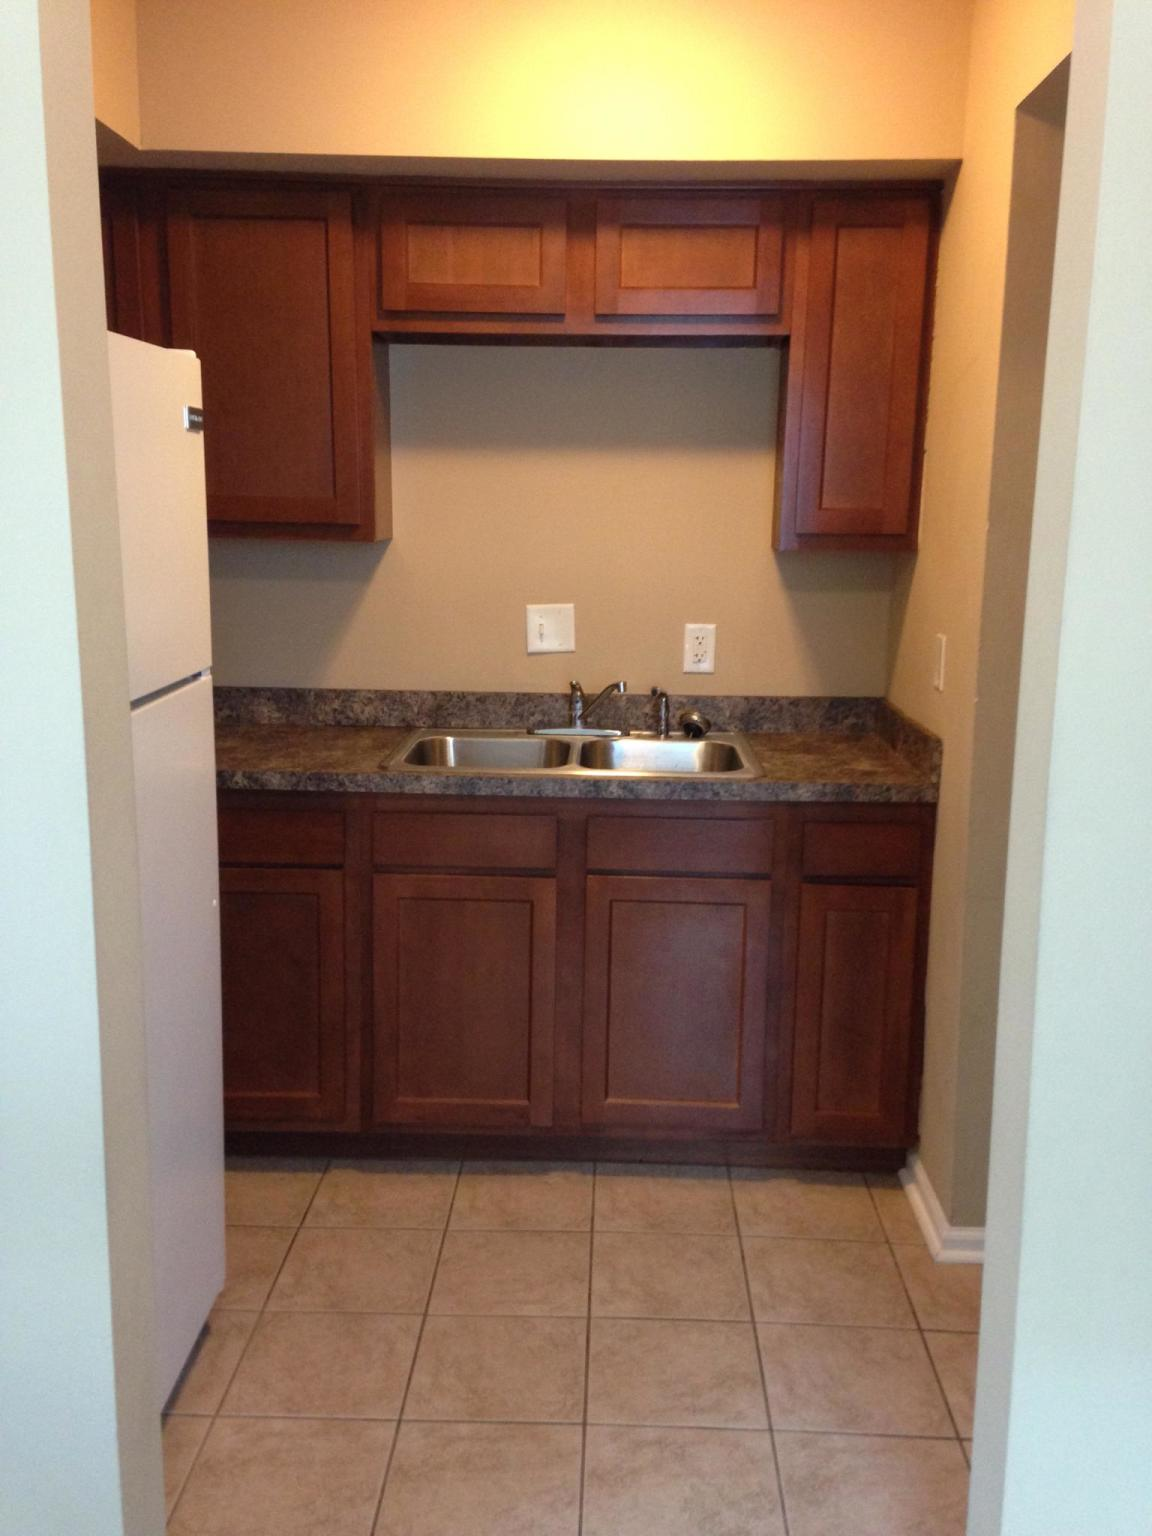 233 Wayne Dr #B24, Richmond, KY 40475 For Rent | Trulia